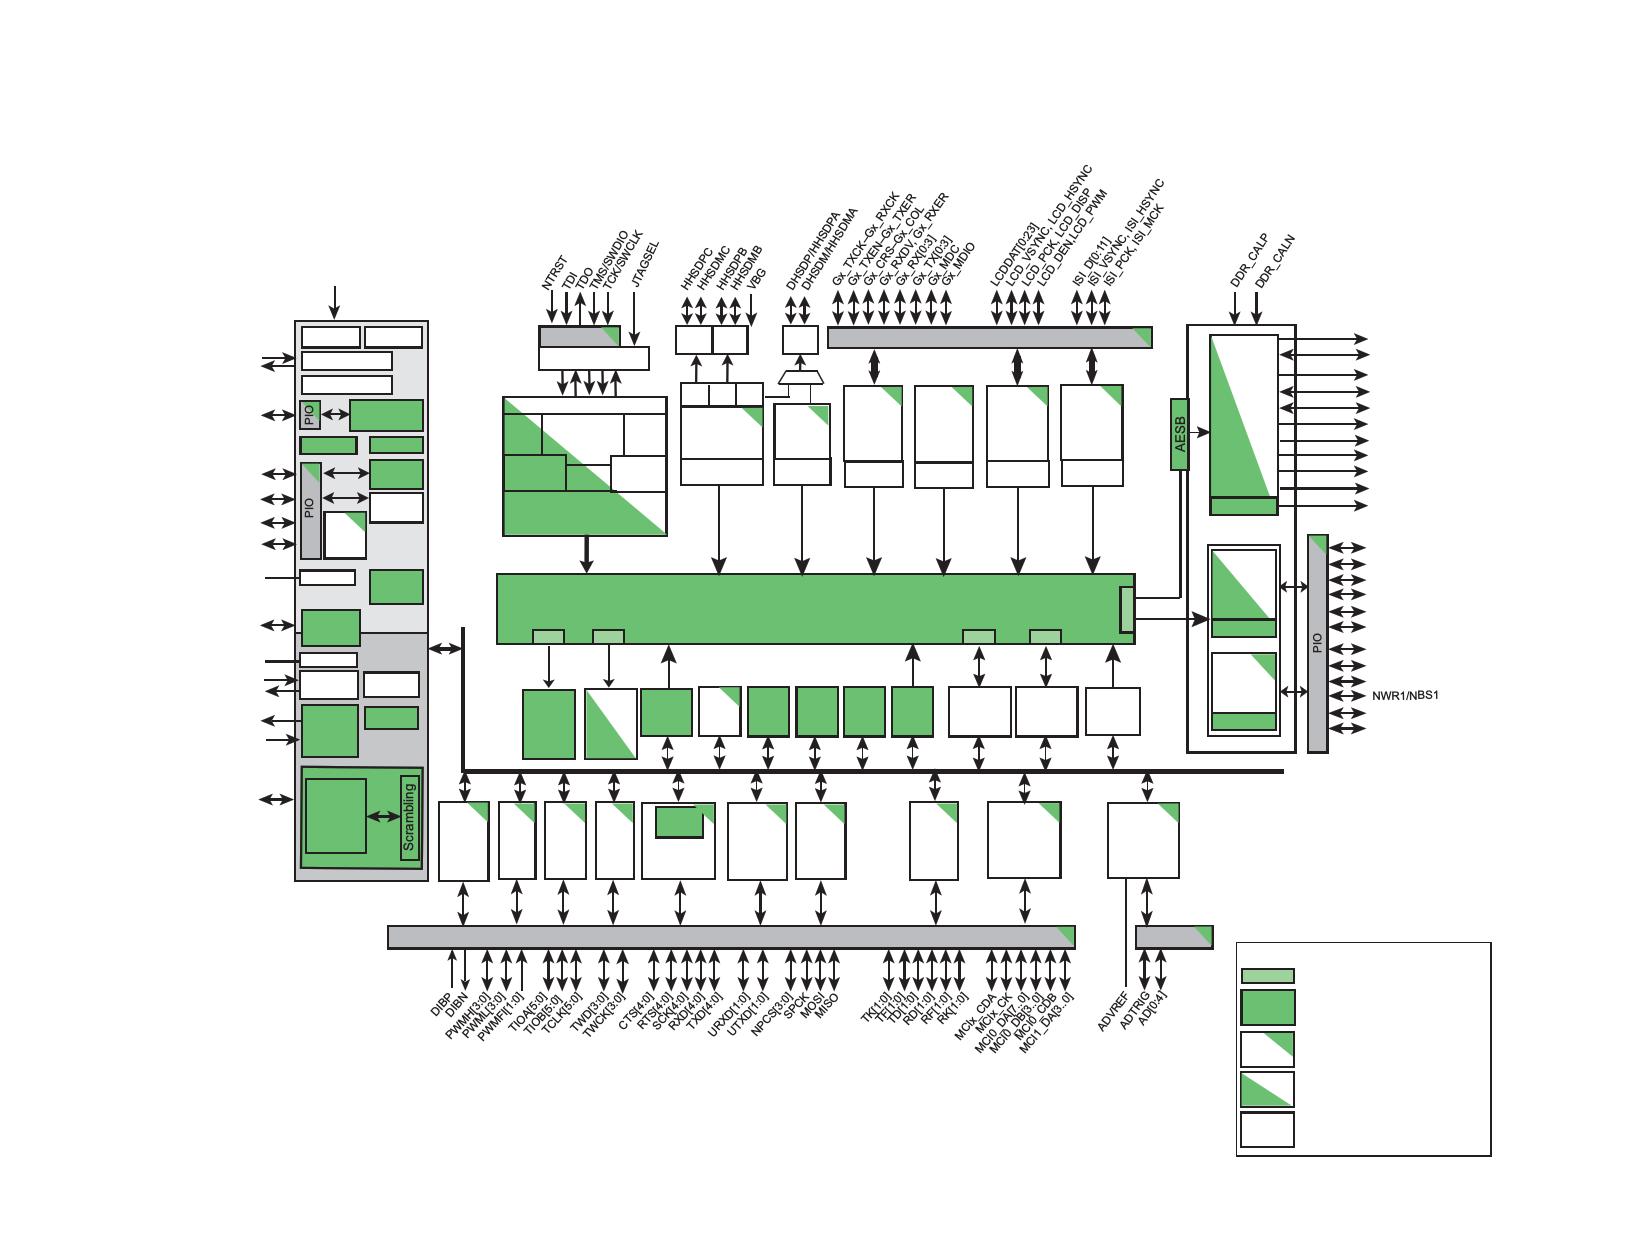 SAMA5D43 pdf, 반도체, 판매, 대치품